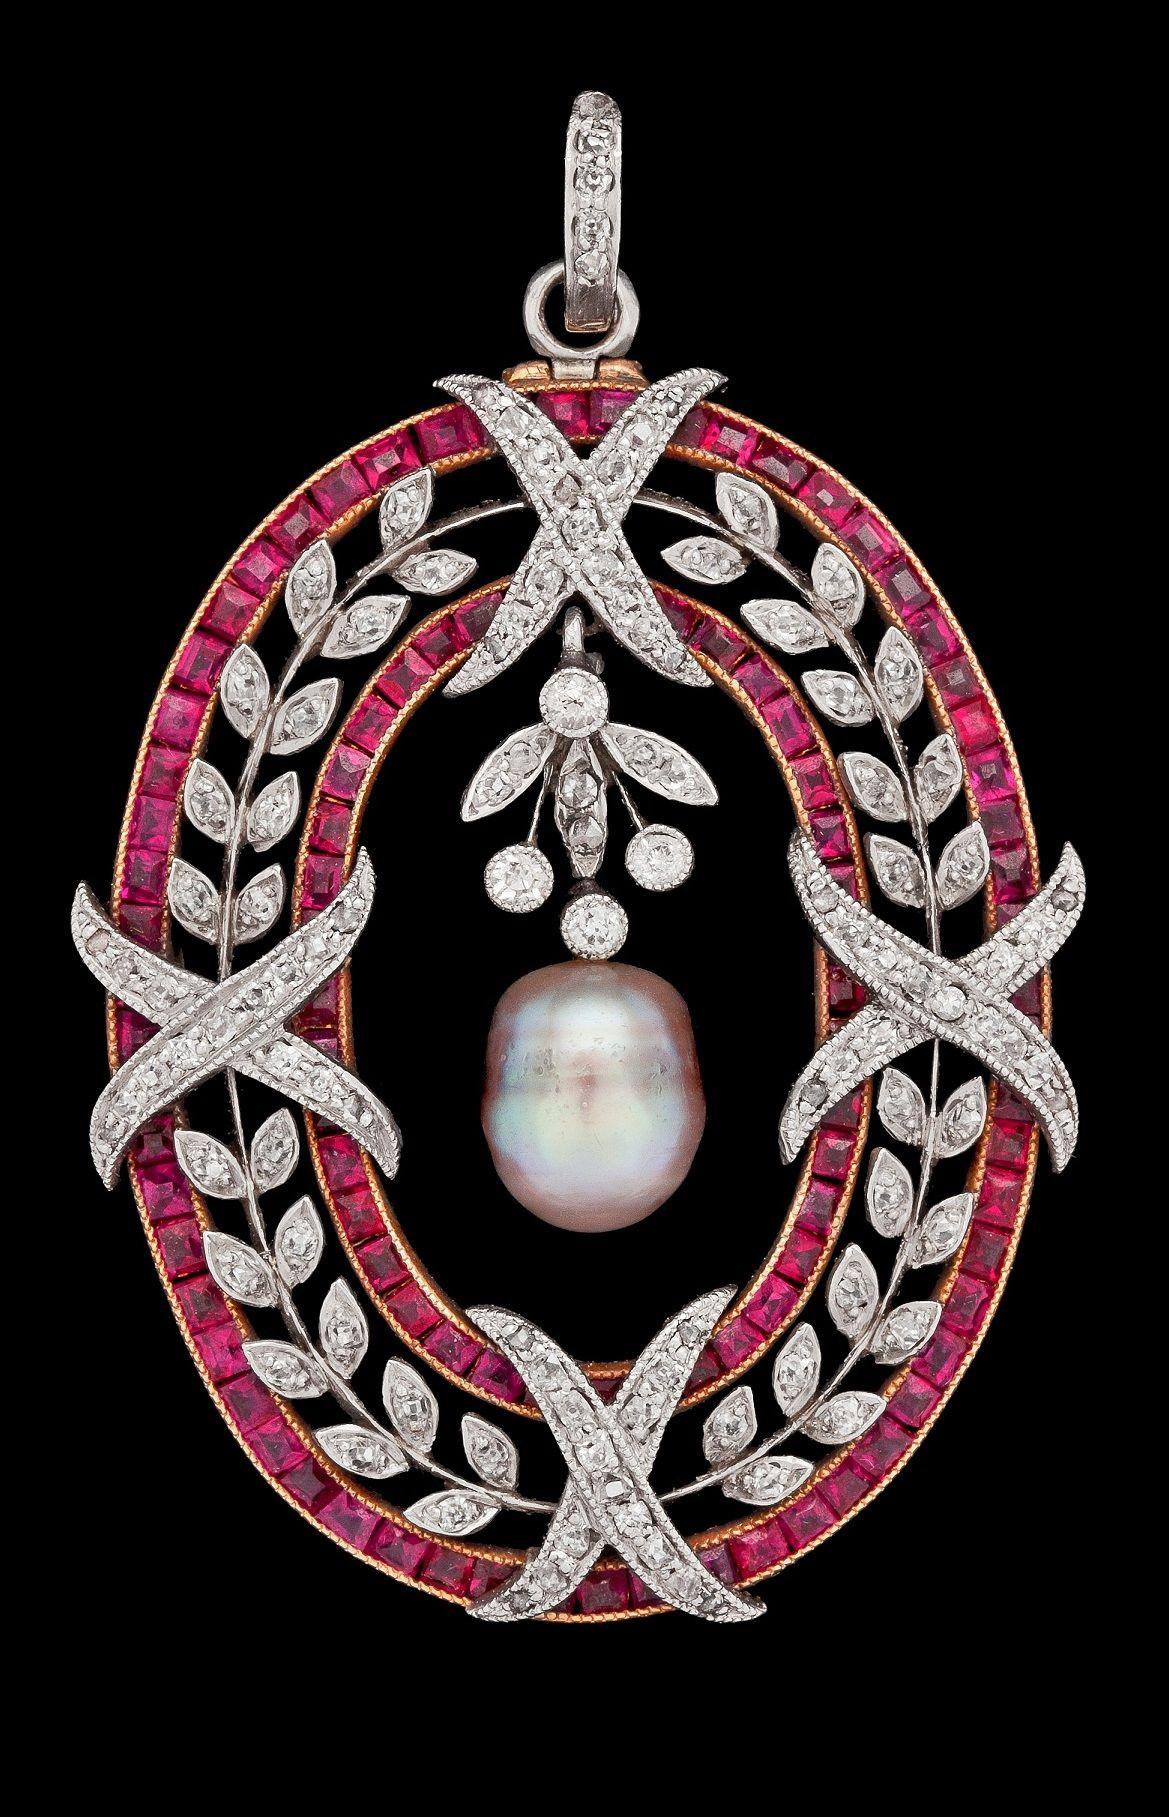 A Belle Epoque Ruby And Diamond Pendant Brooch Circa 1900